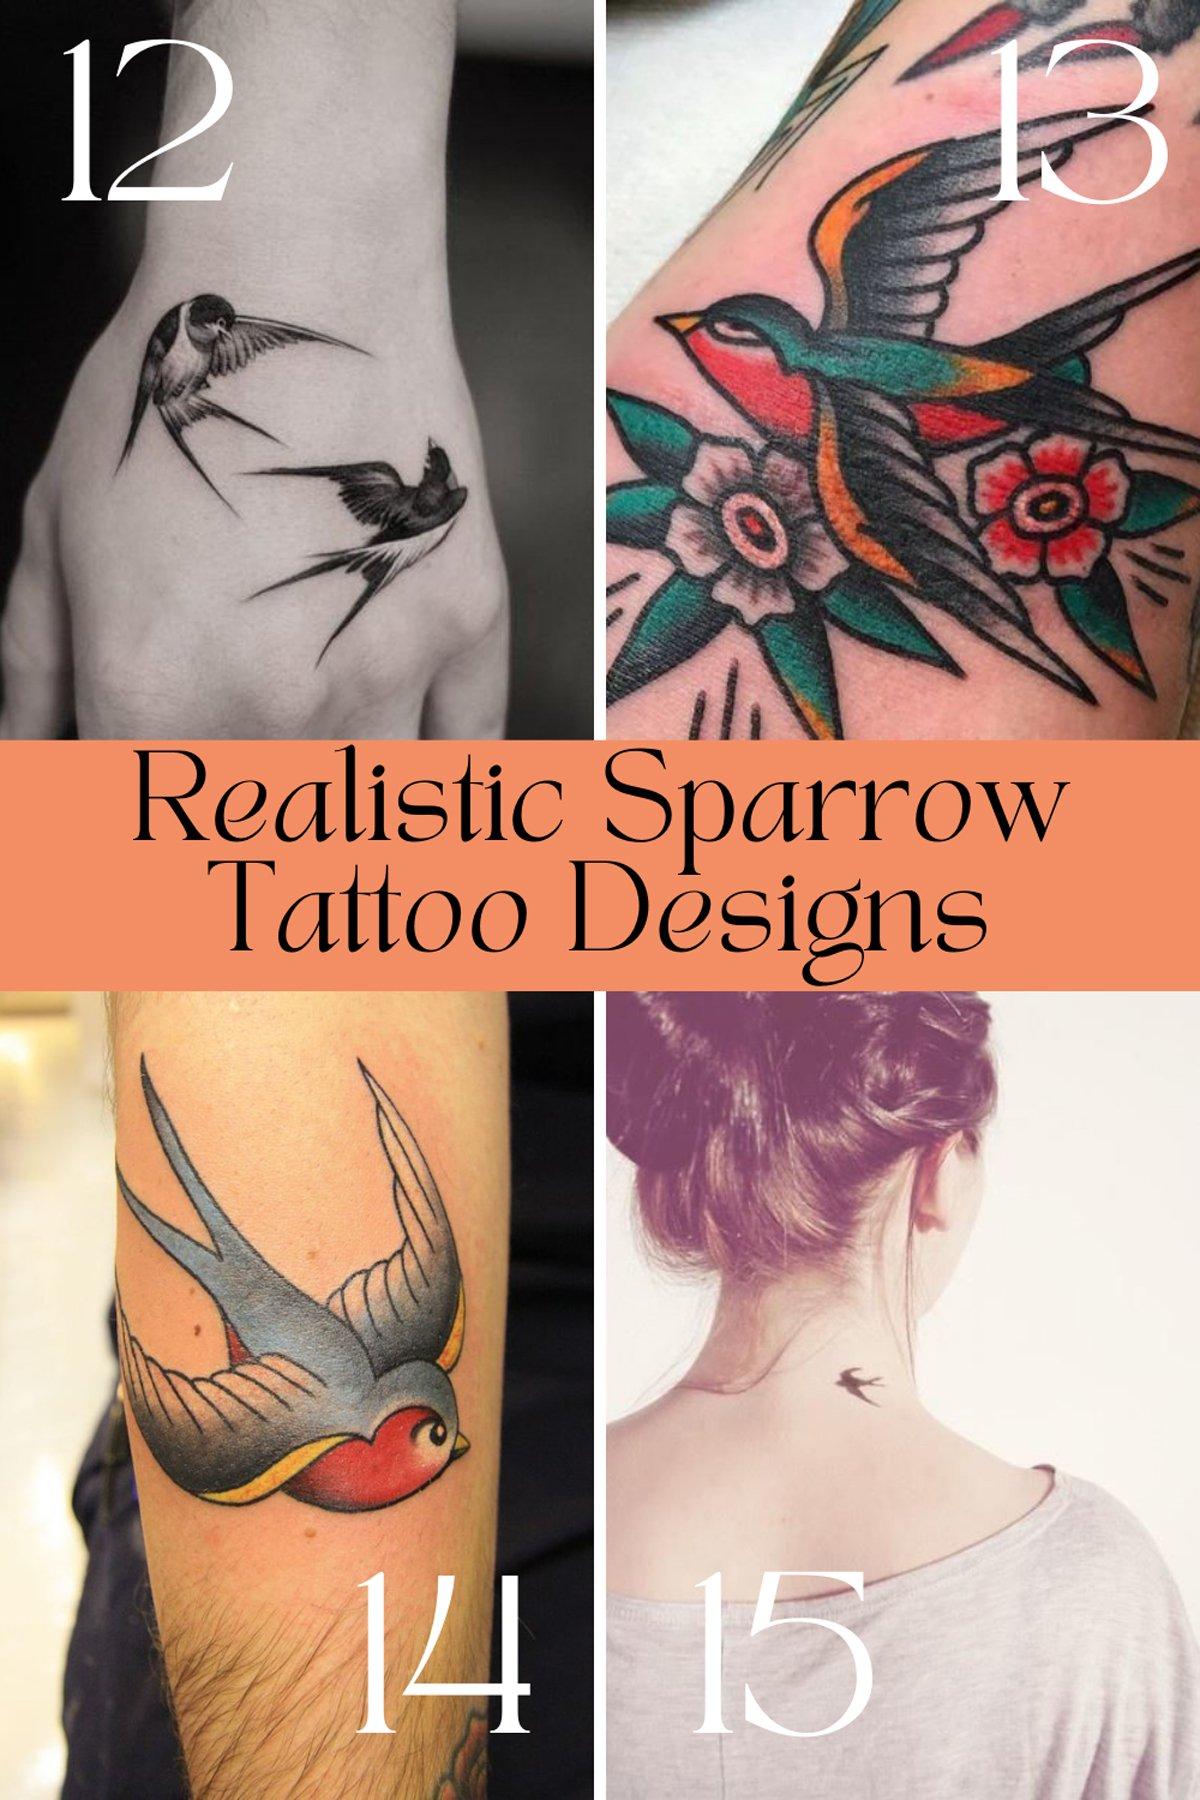 Realistic Sparrow Tattoo Designs